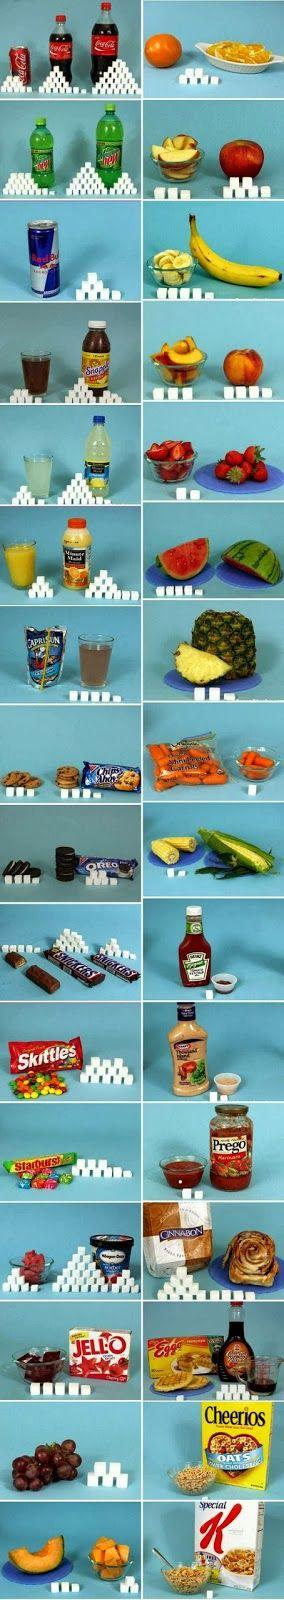 Breaking World News: How much Sugar are you consuming onto http://breakingworldnewsinfo.blogspot.co.at/2013/09/how-much-sugar-are-you-consuming.html